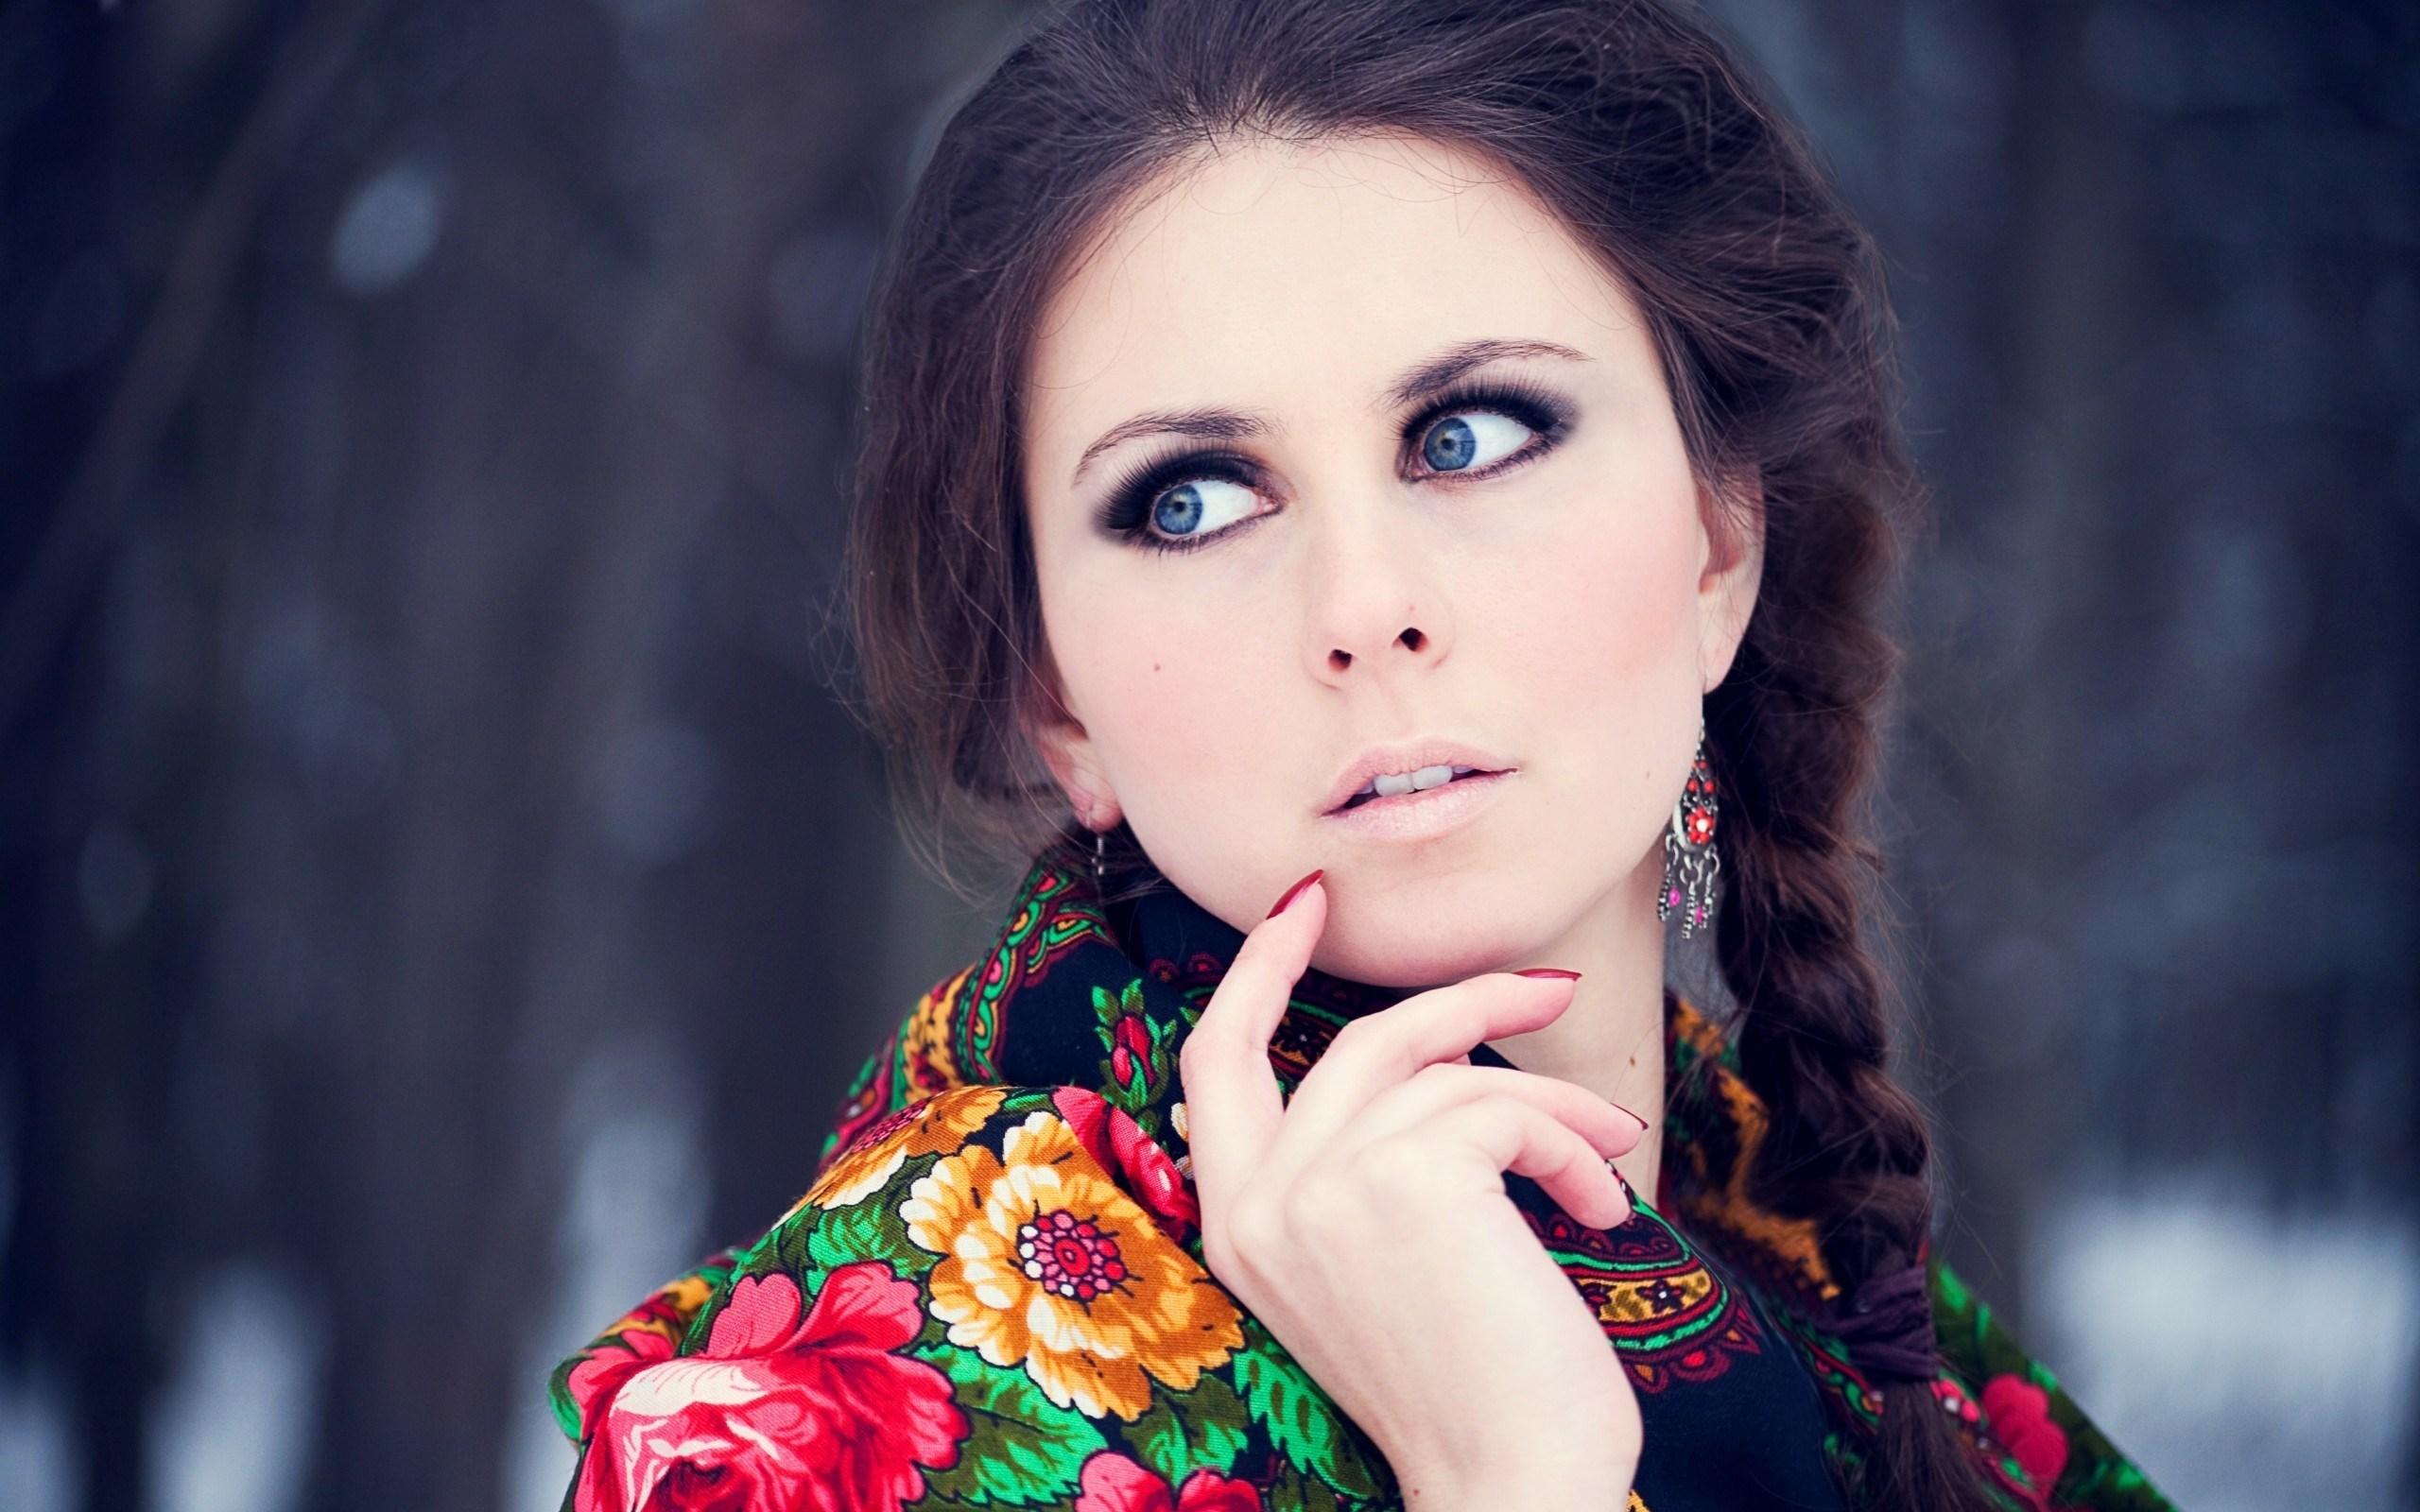 Russian Girl HD Wallpaper